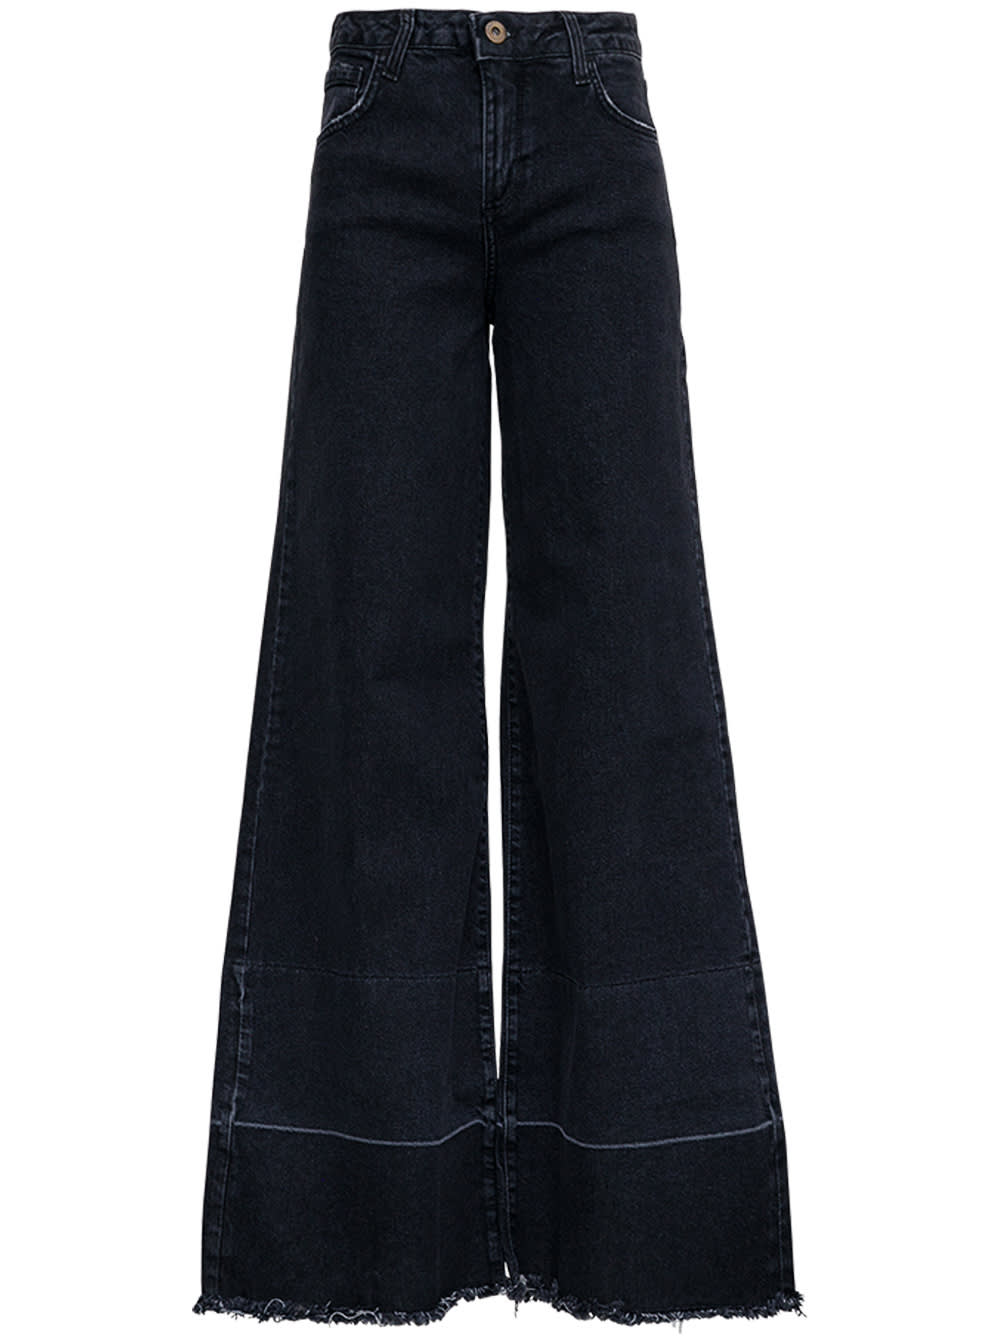 Wide Leg Fringed Jeans